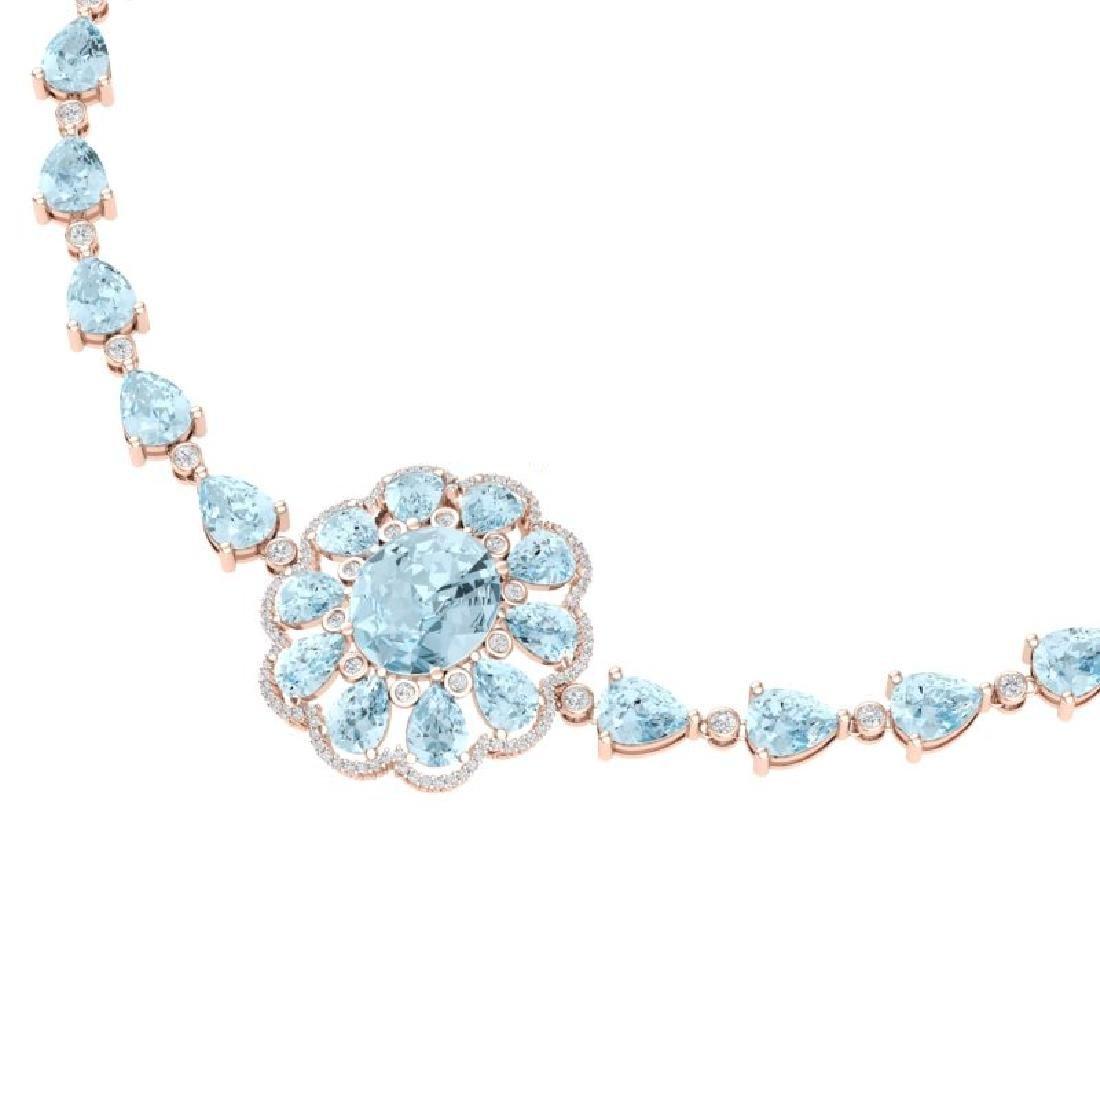 75.99 CTW Royalty Sky Topaz & VS Diamond Necklace 18K